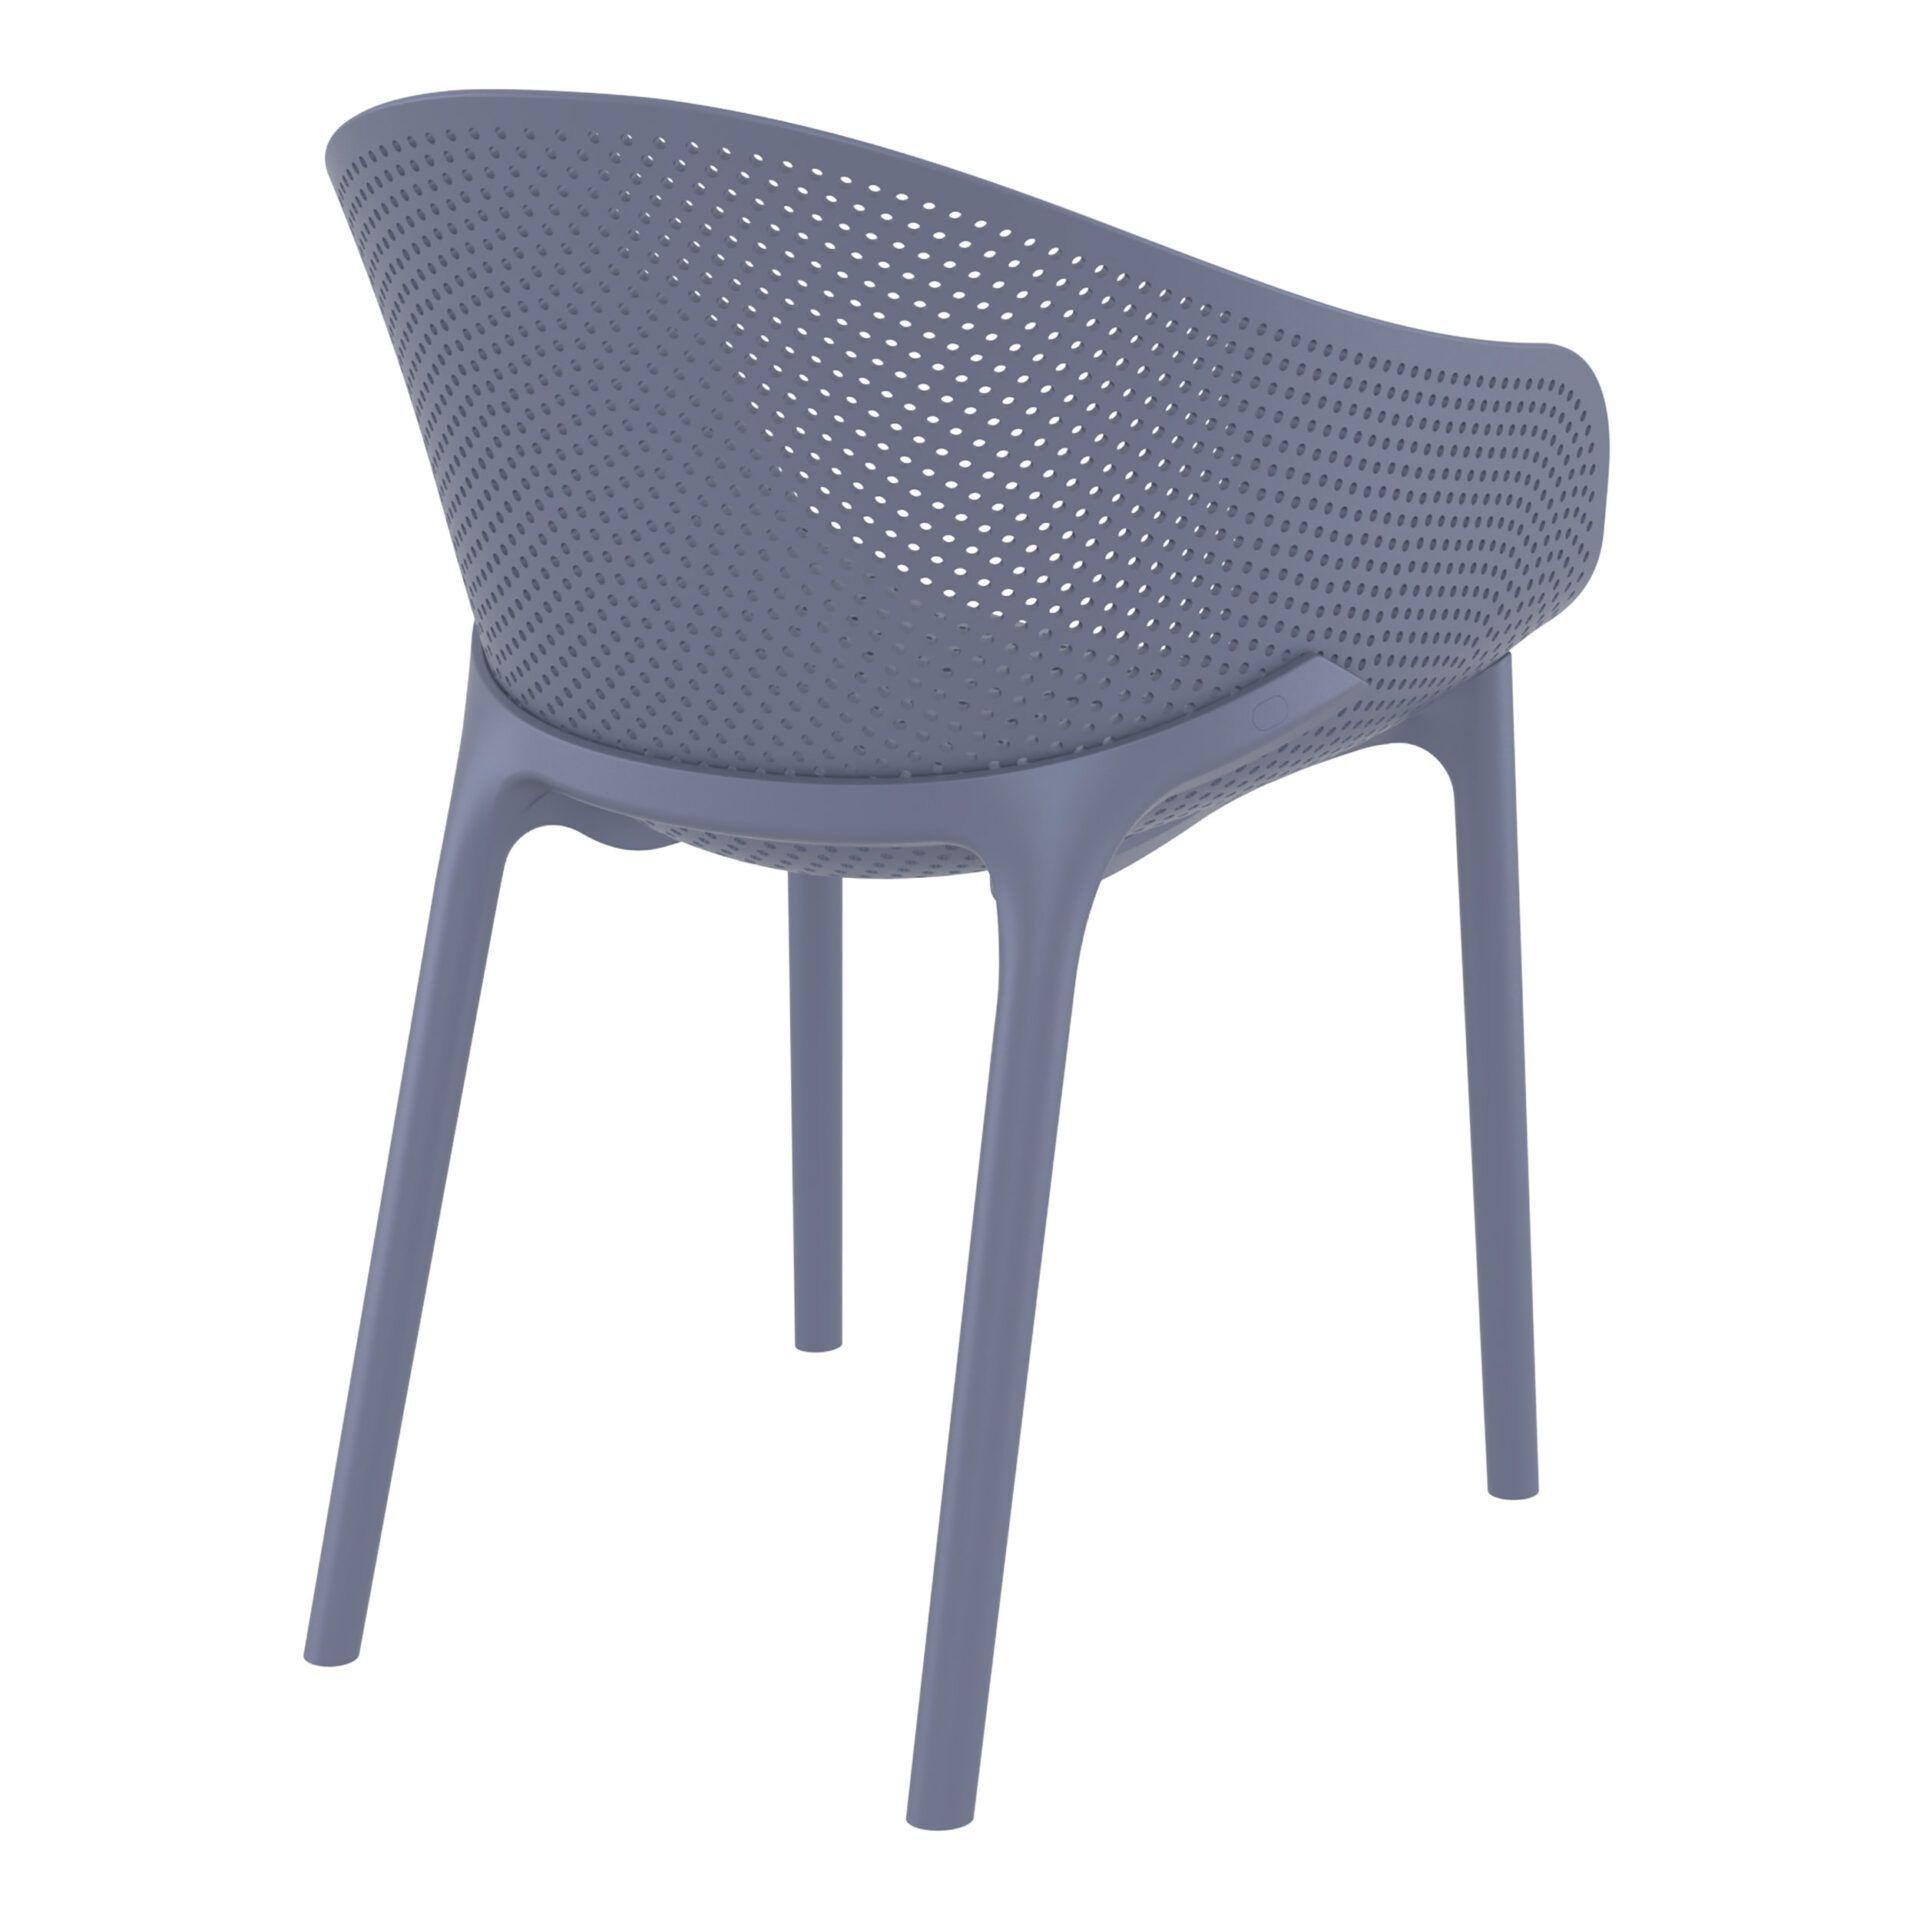 outdoor seating polypropylene sky chair darkgrey back side